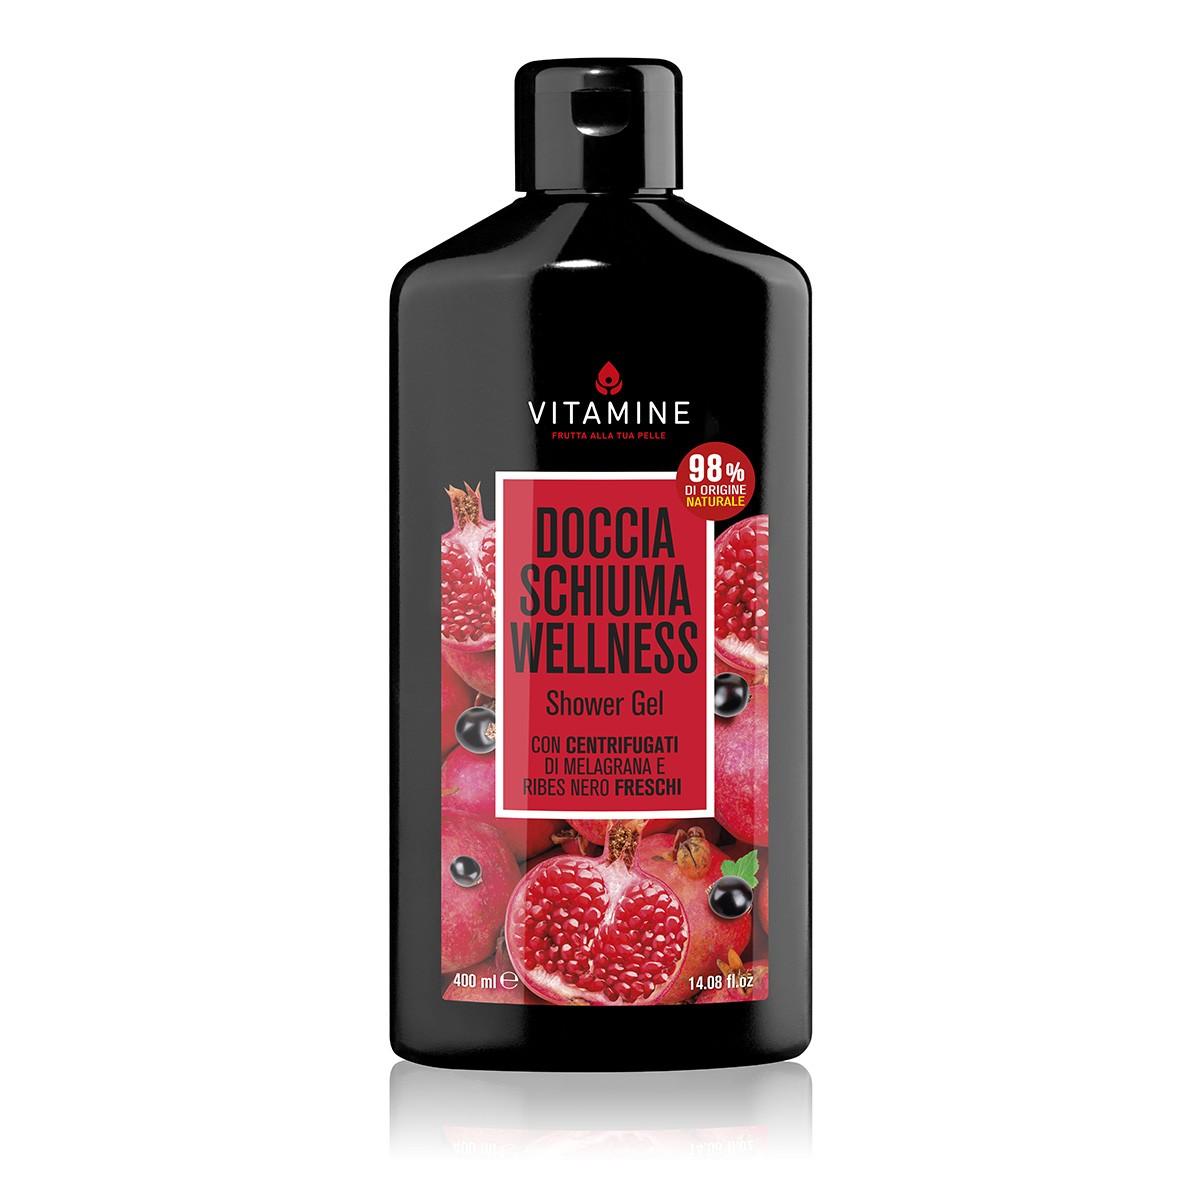 Vitamine健康紅石榴黑醋栗沐浴露 400ml